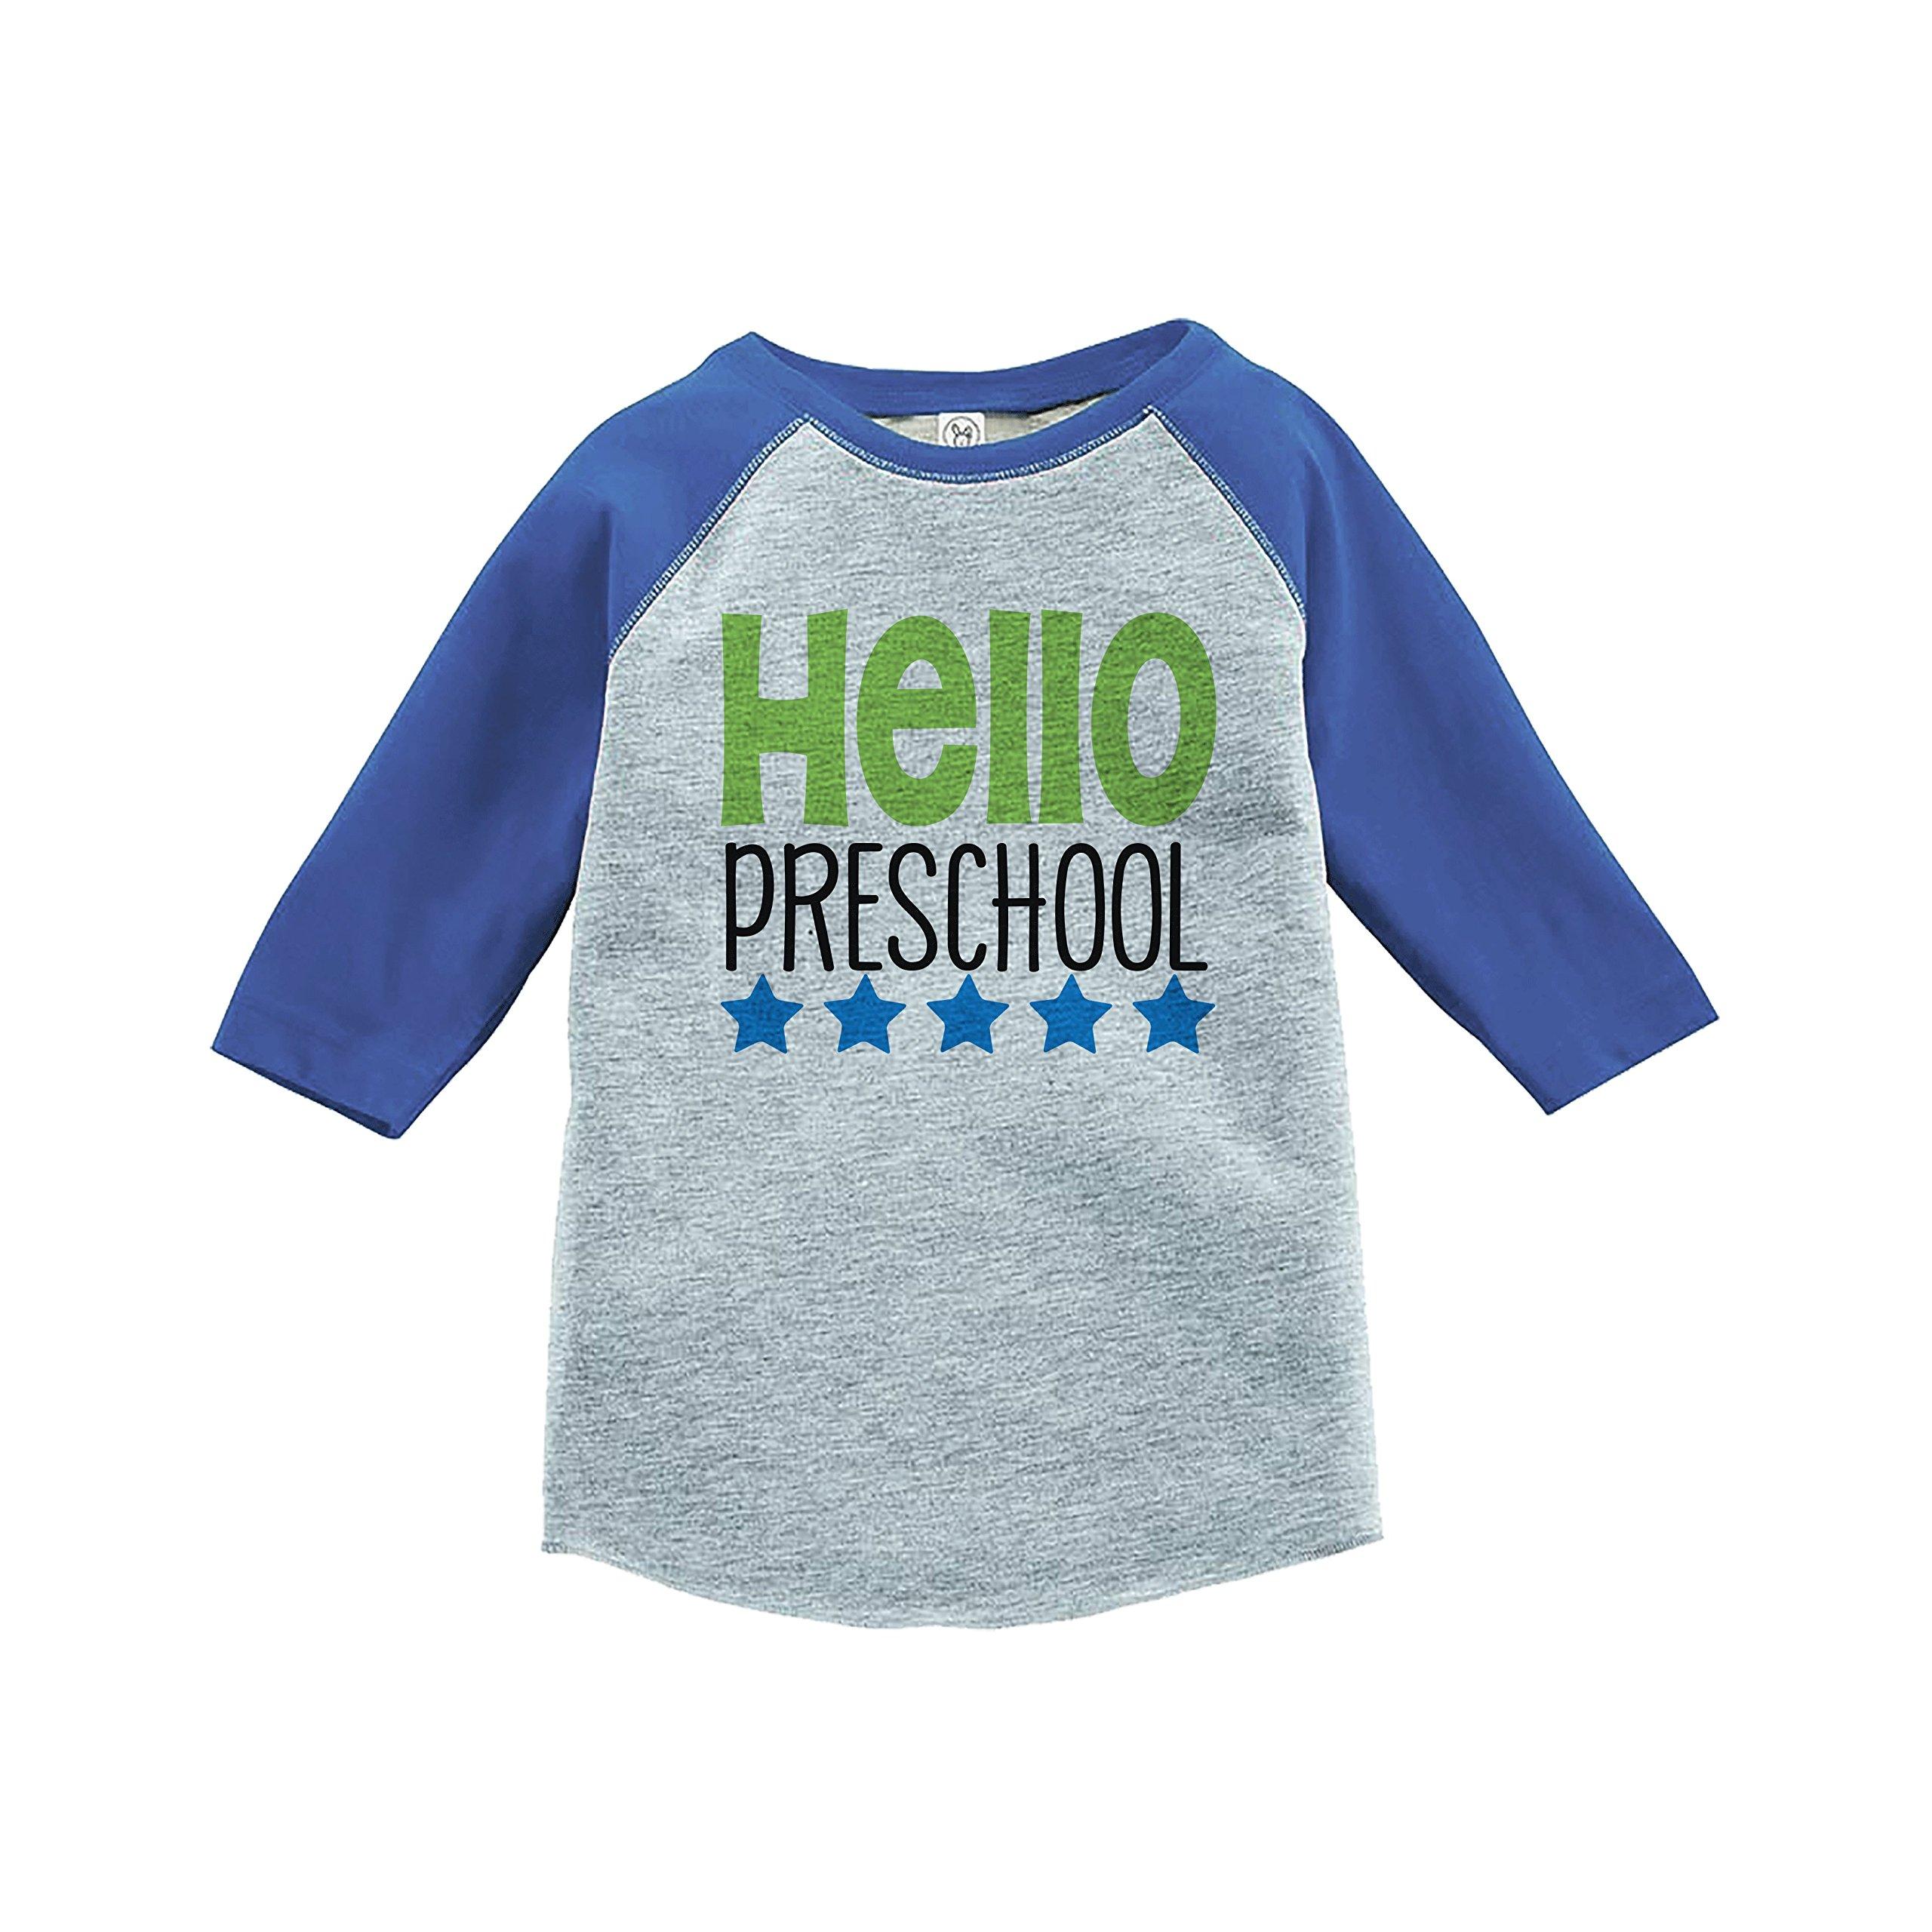 7 ate 9 Apparel Kids Hello Preschool School Shirt